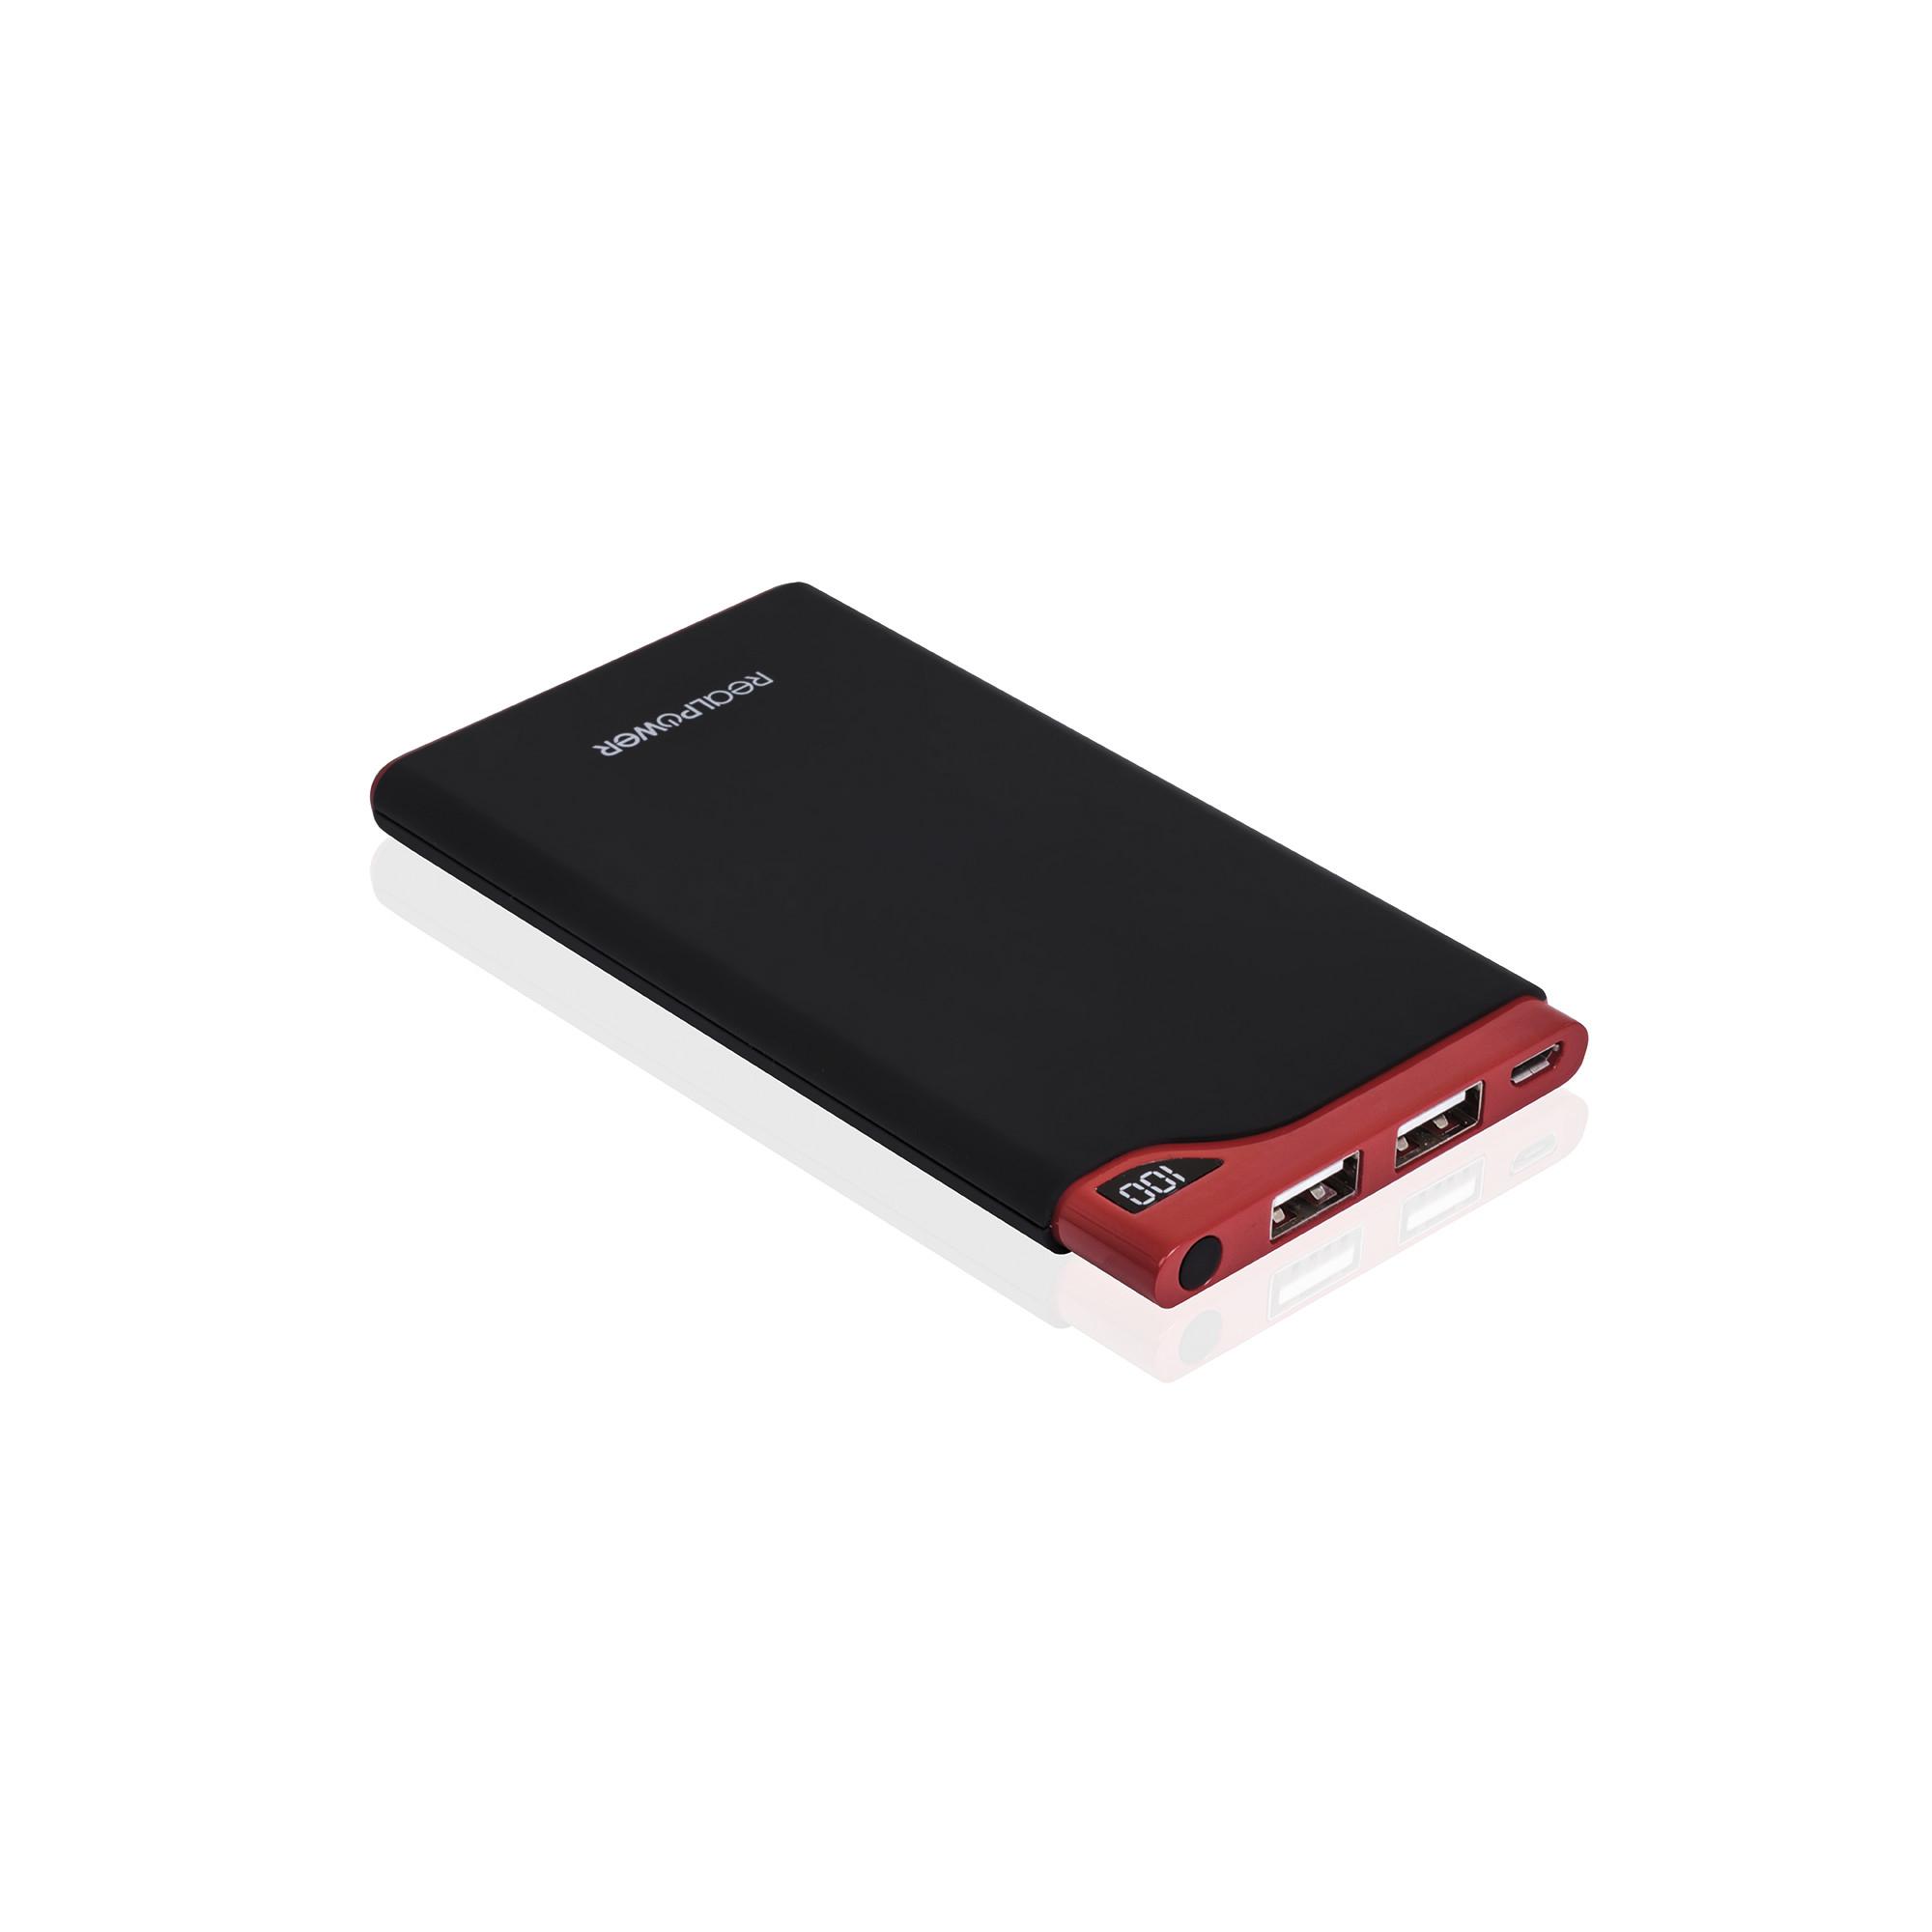 RealPower PB-6000S - Schwarz - Rot - Handy/Smartphone - Tablet - CE - TÜV GS - China - Lithium Polymer (LiPo) - 6000 mAh